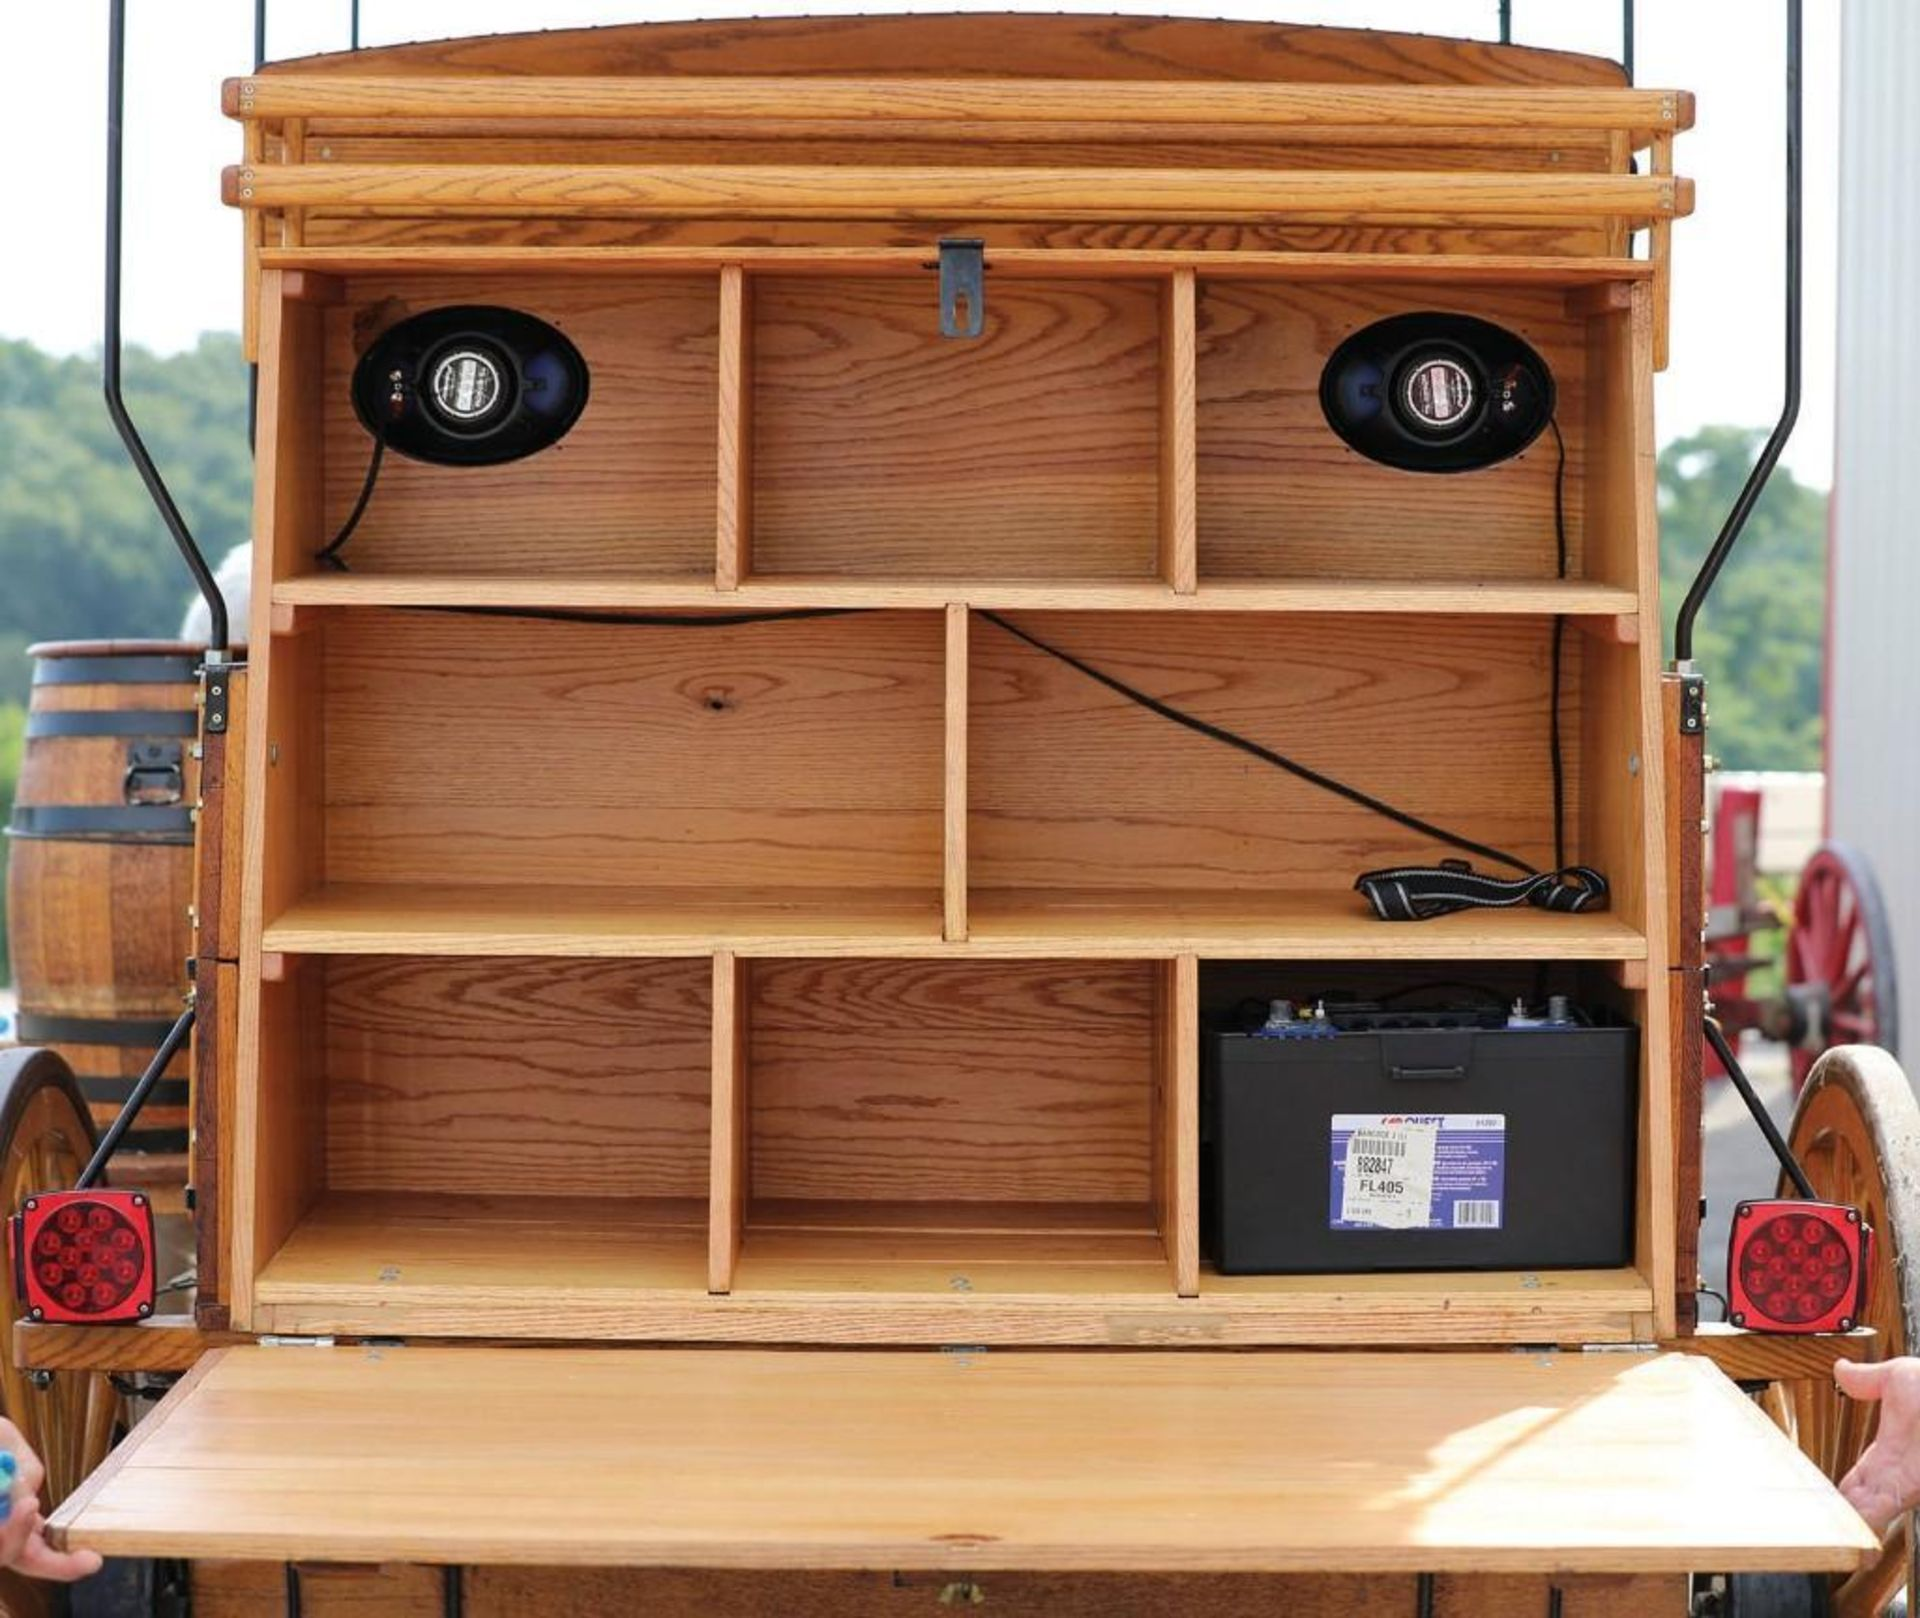 New Picnic Wagon, Fringe Top - Image 3 of 3